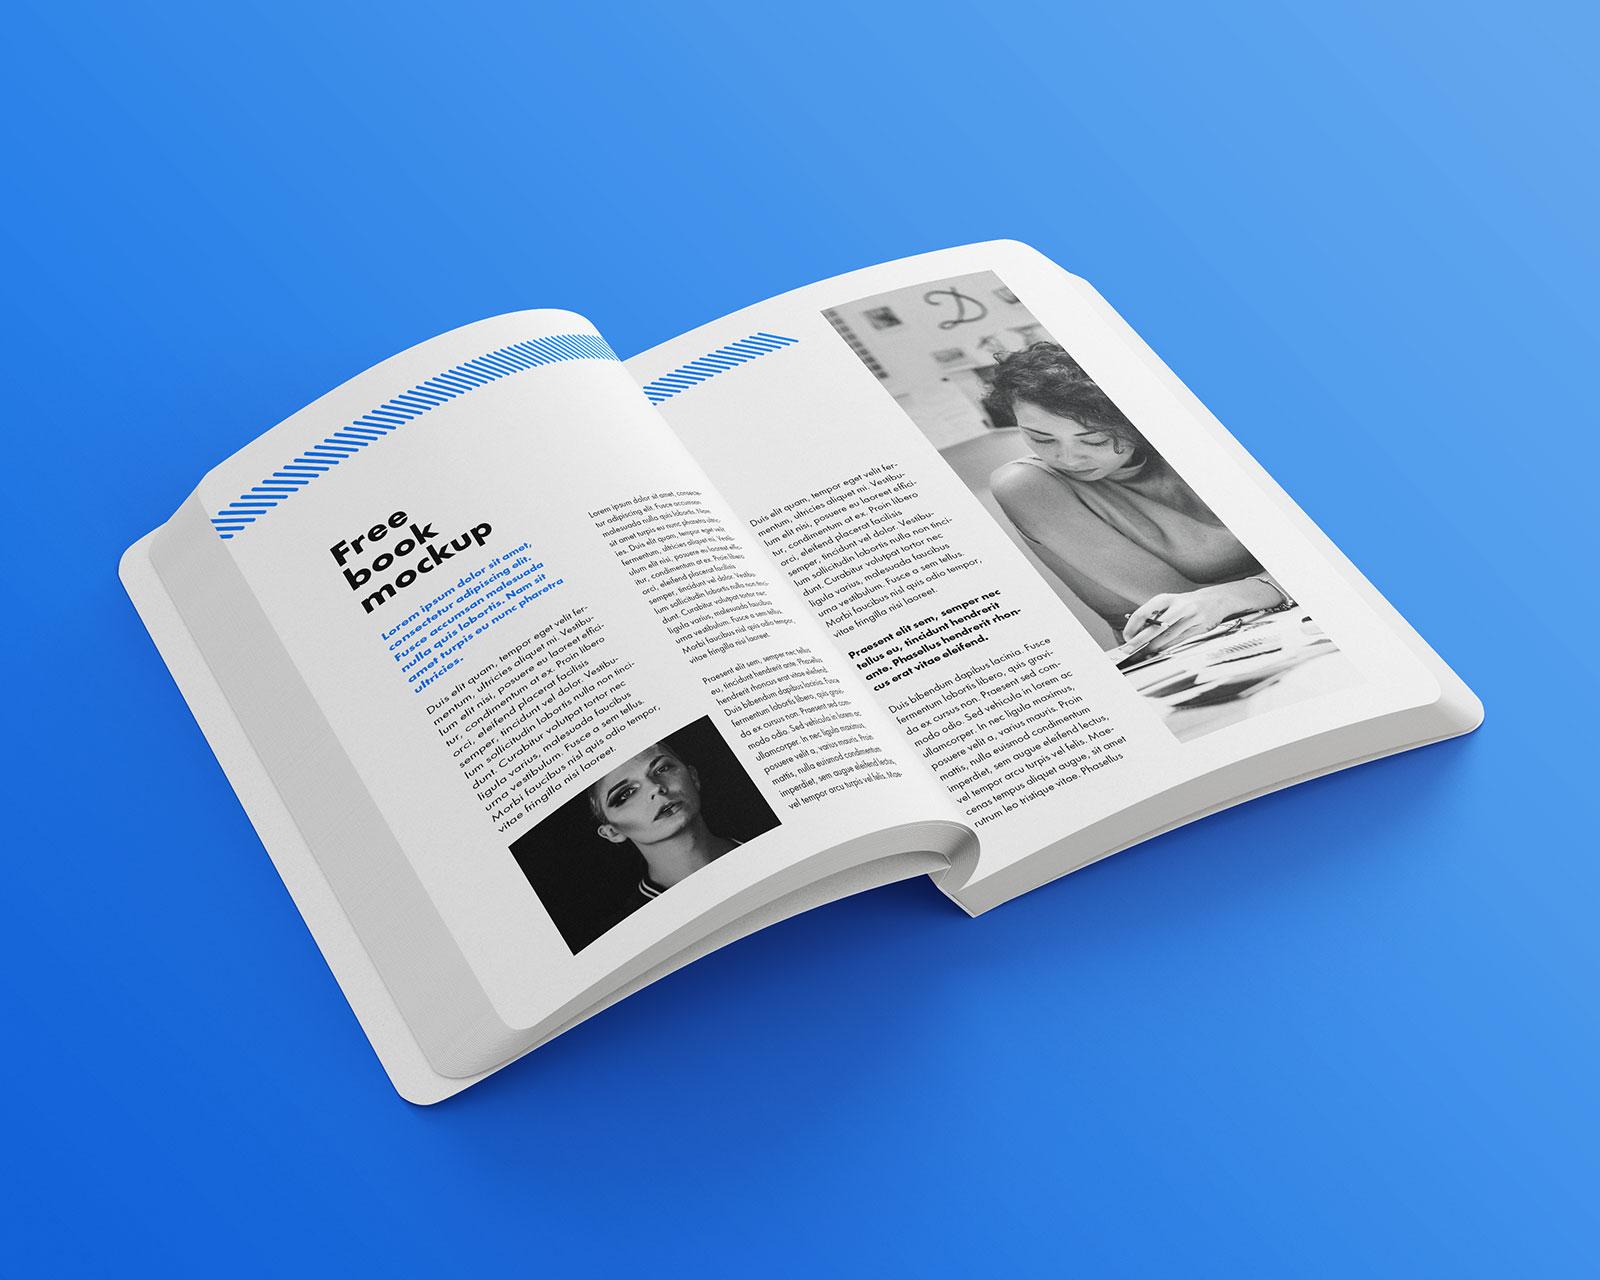 Free-Rounded-Corner-Paperback-Book-Mockup-PSD-Set-4